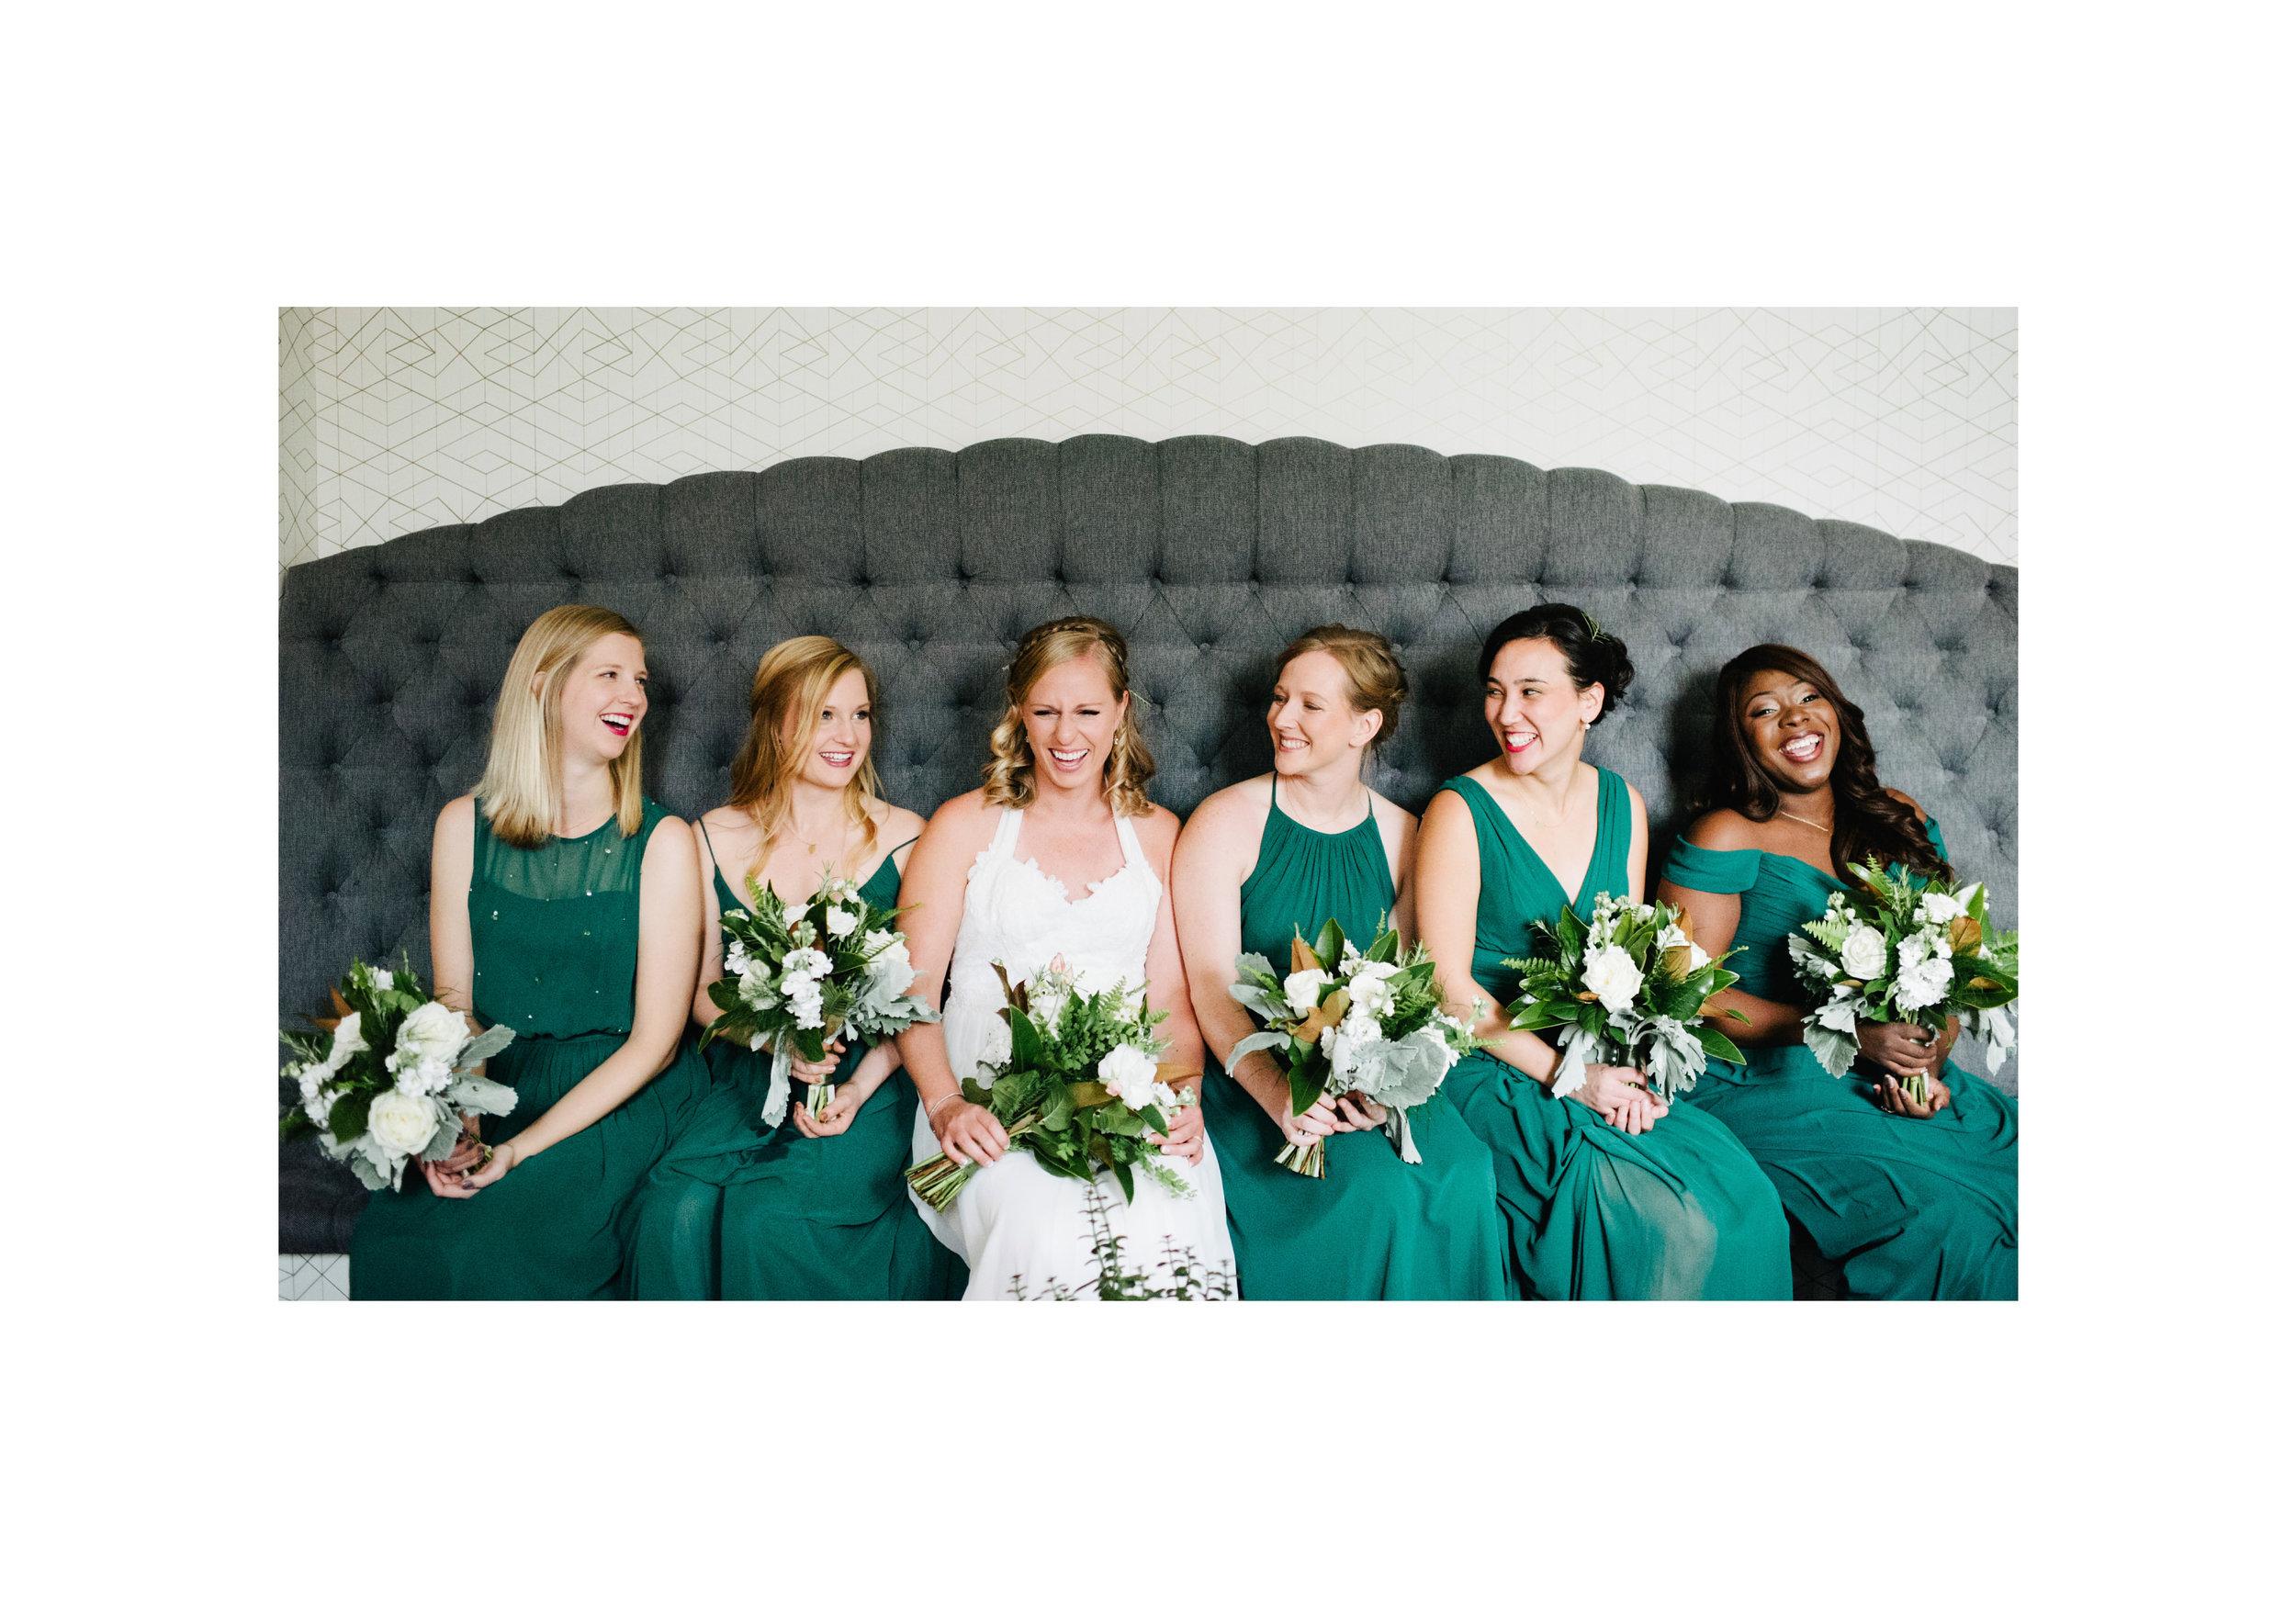 the-evergreen-pdx-portland-wedding-photographer-ashley-courter-0001.JPG